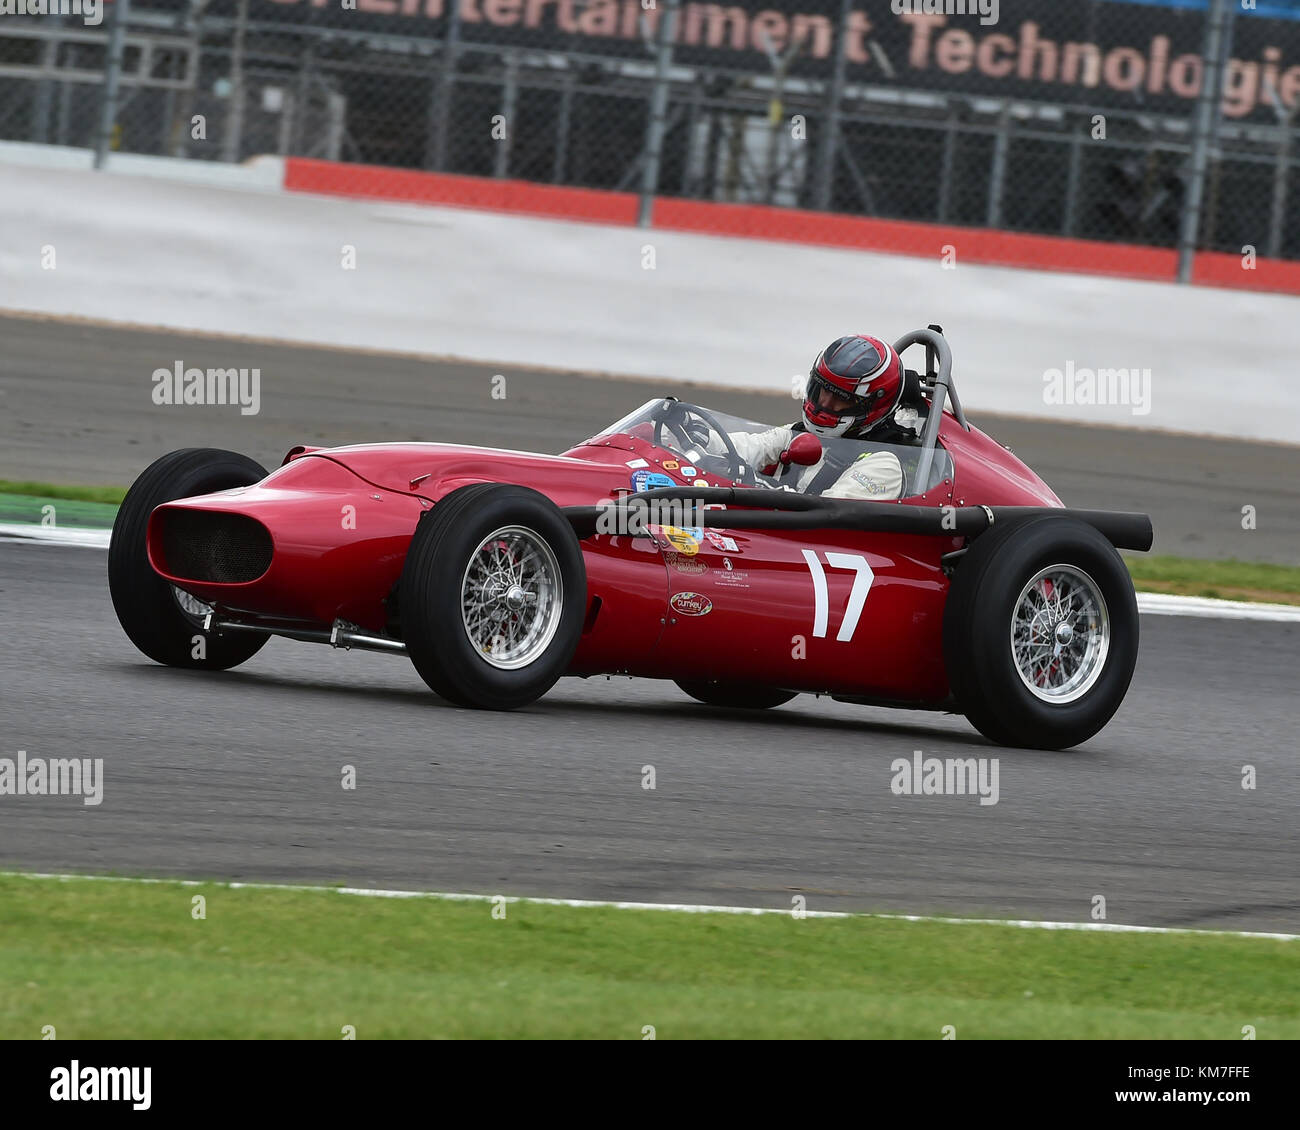 Tony Wood Maserati Tecmec Maserati Trophy For Hgpca Pre 66 Grand